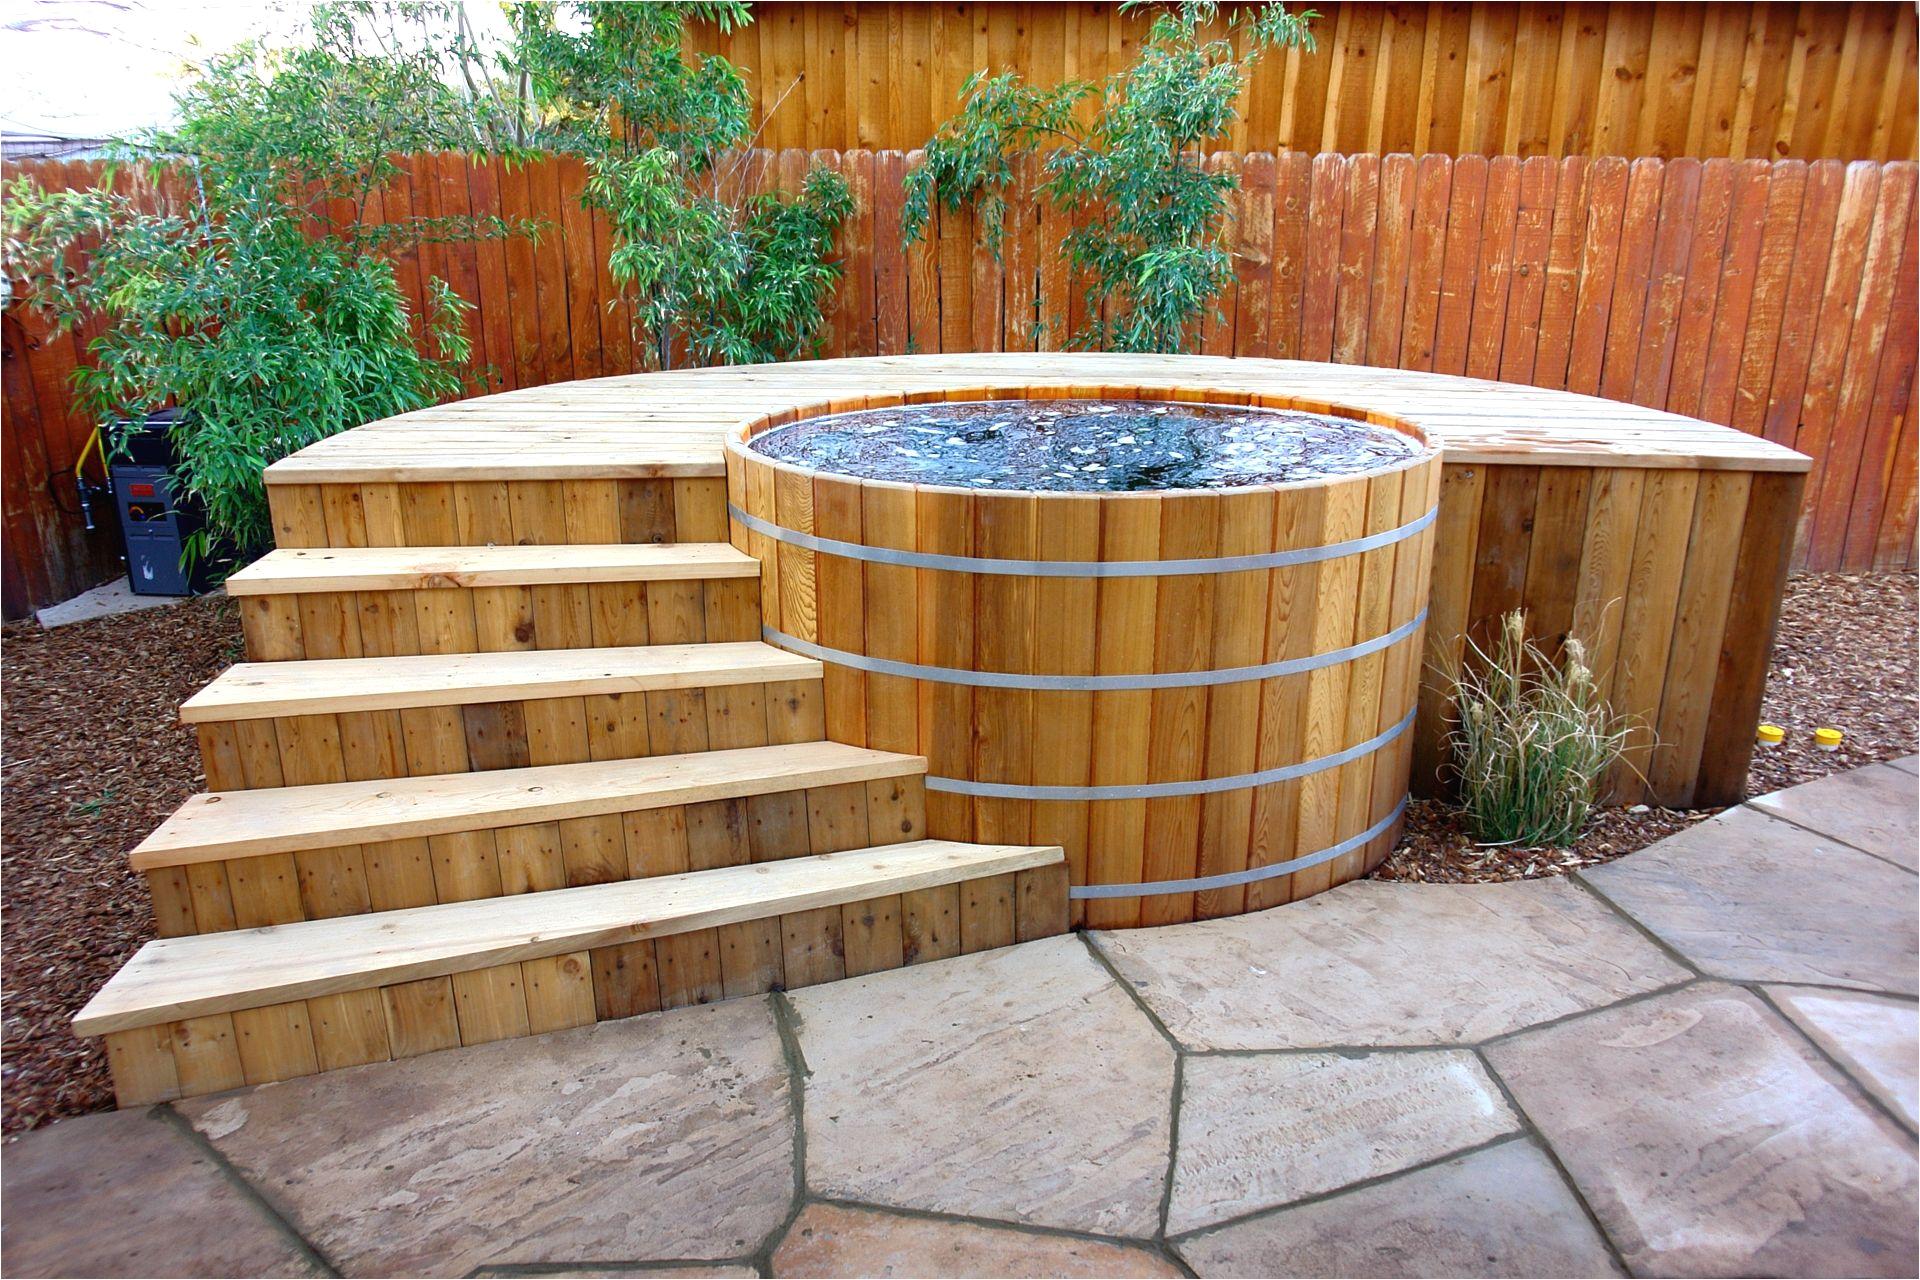 Cedar Outdoor Bathtub Cedar Hot Tub From Zen Bathworks with My Design Of A Cedar